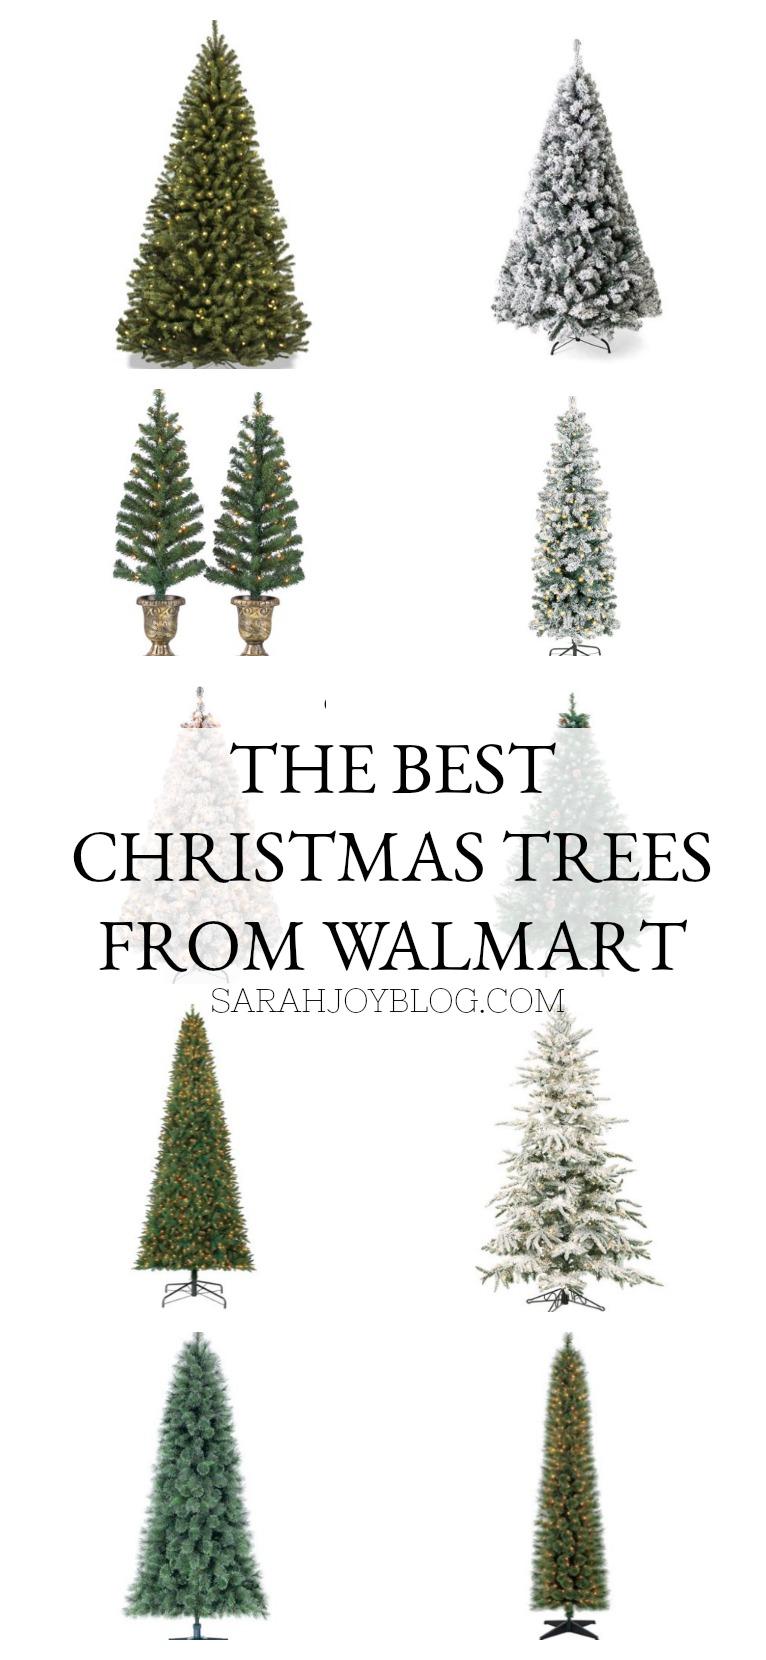 Farmhouse Style Christmas Decor from Walmart. The top rated Christmas trees from Walmart.